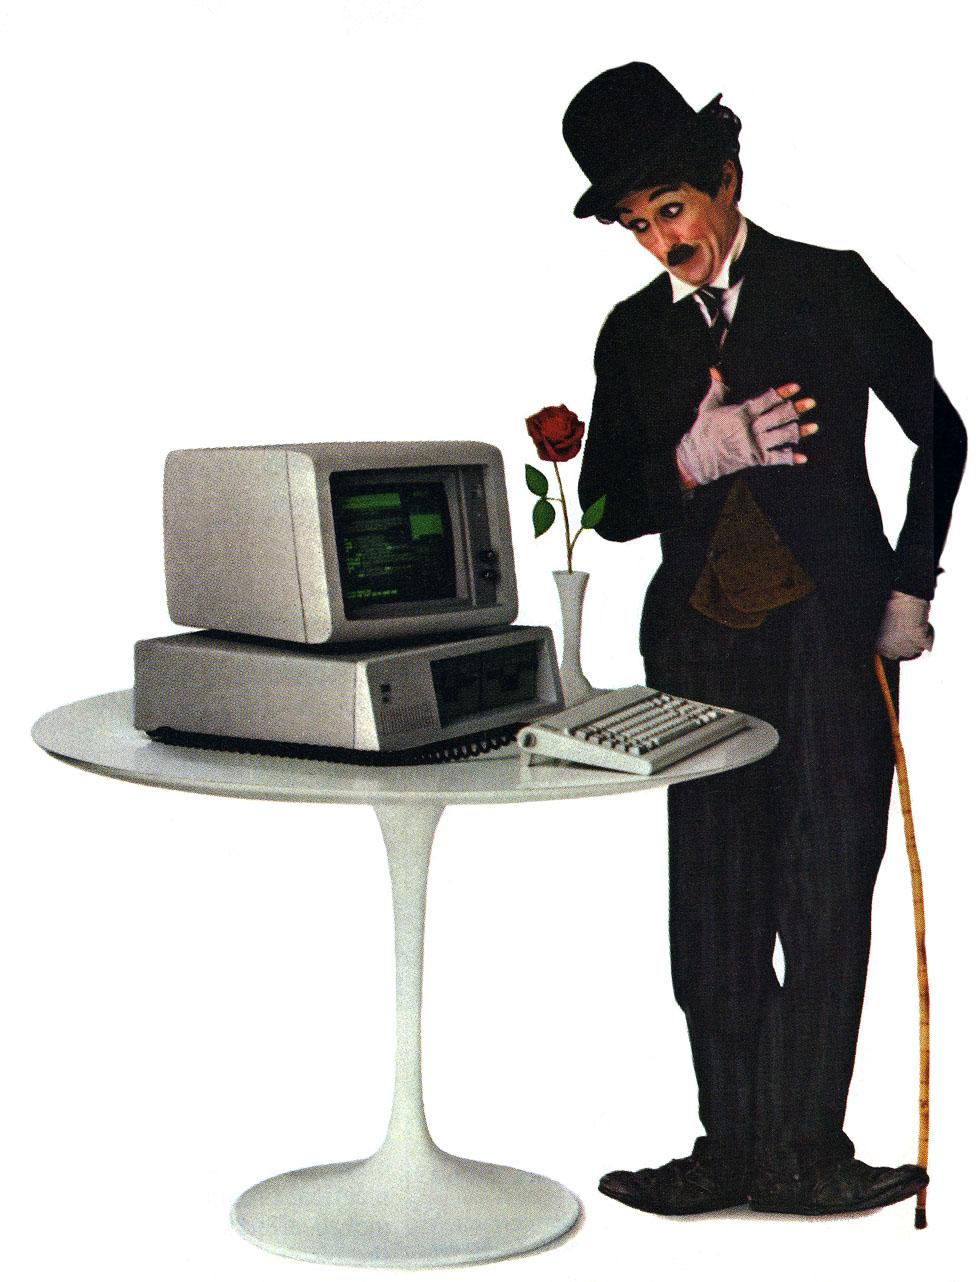 Charlie-chaplin-IBMjr-personal-computer-ad